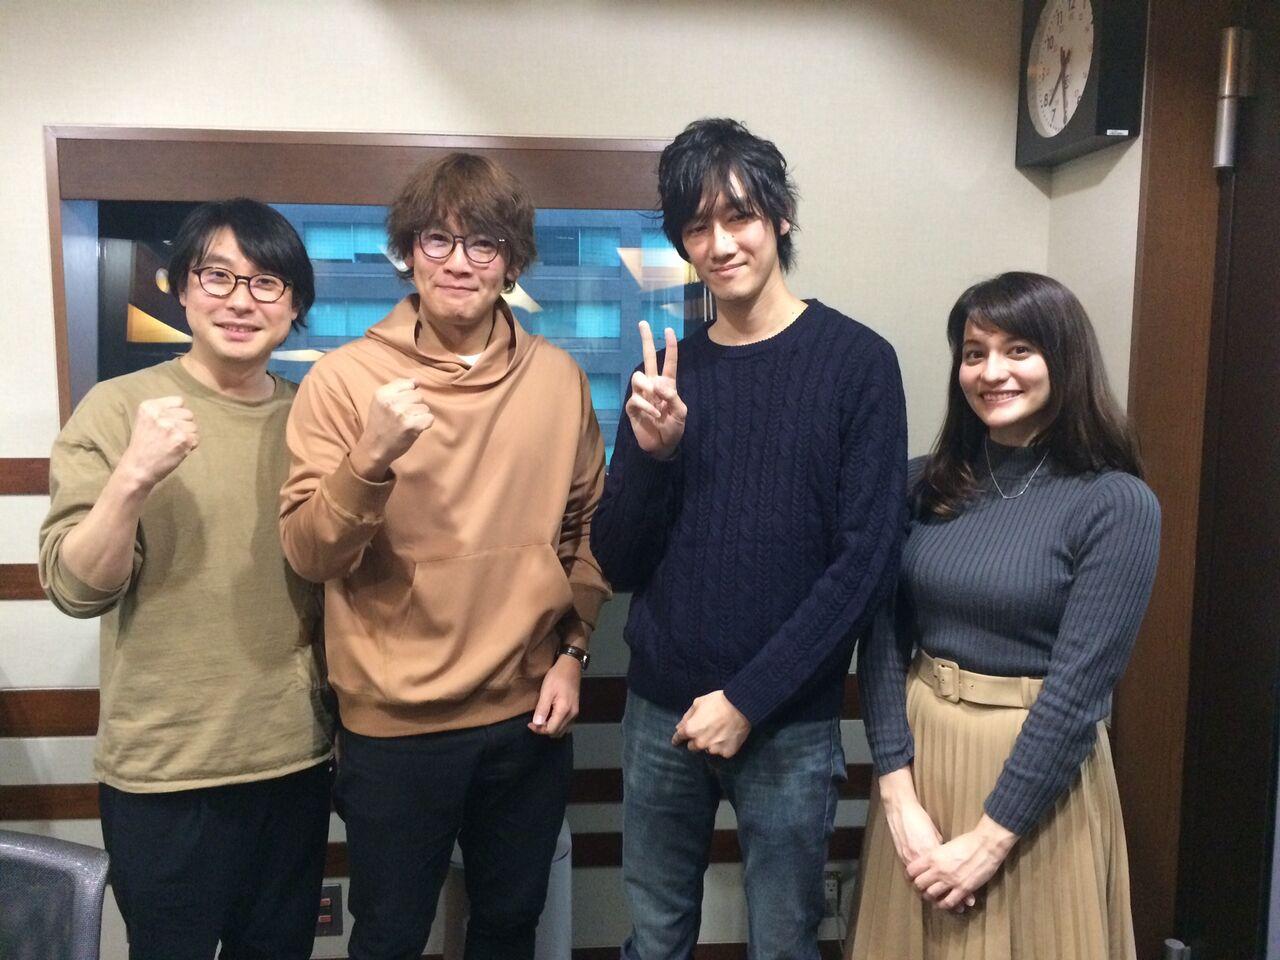 TOKYO FMのONE MORNINGさんに出演させていただきました